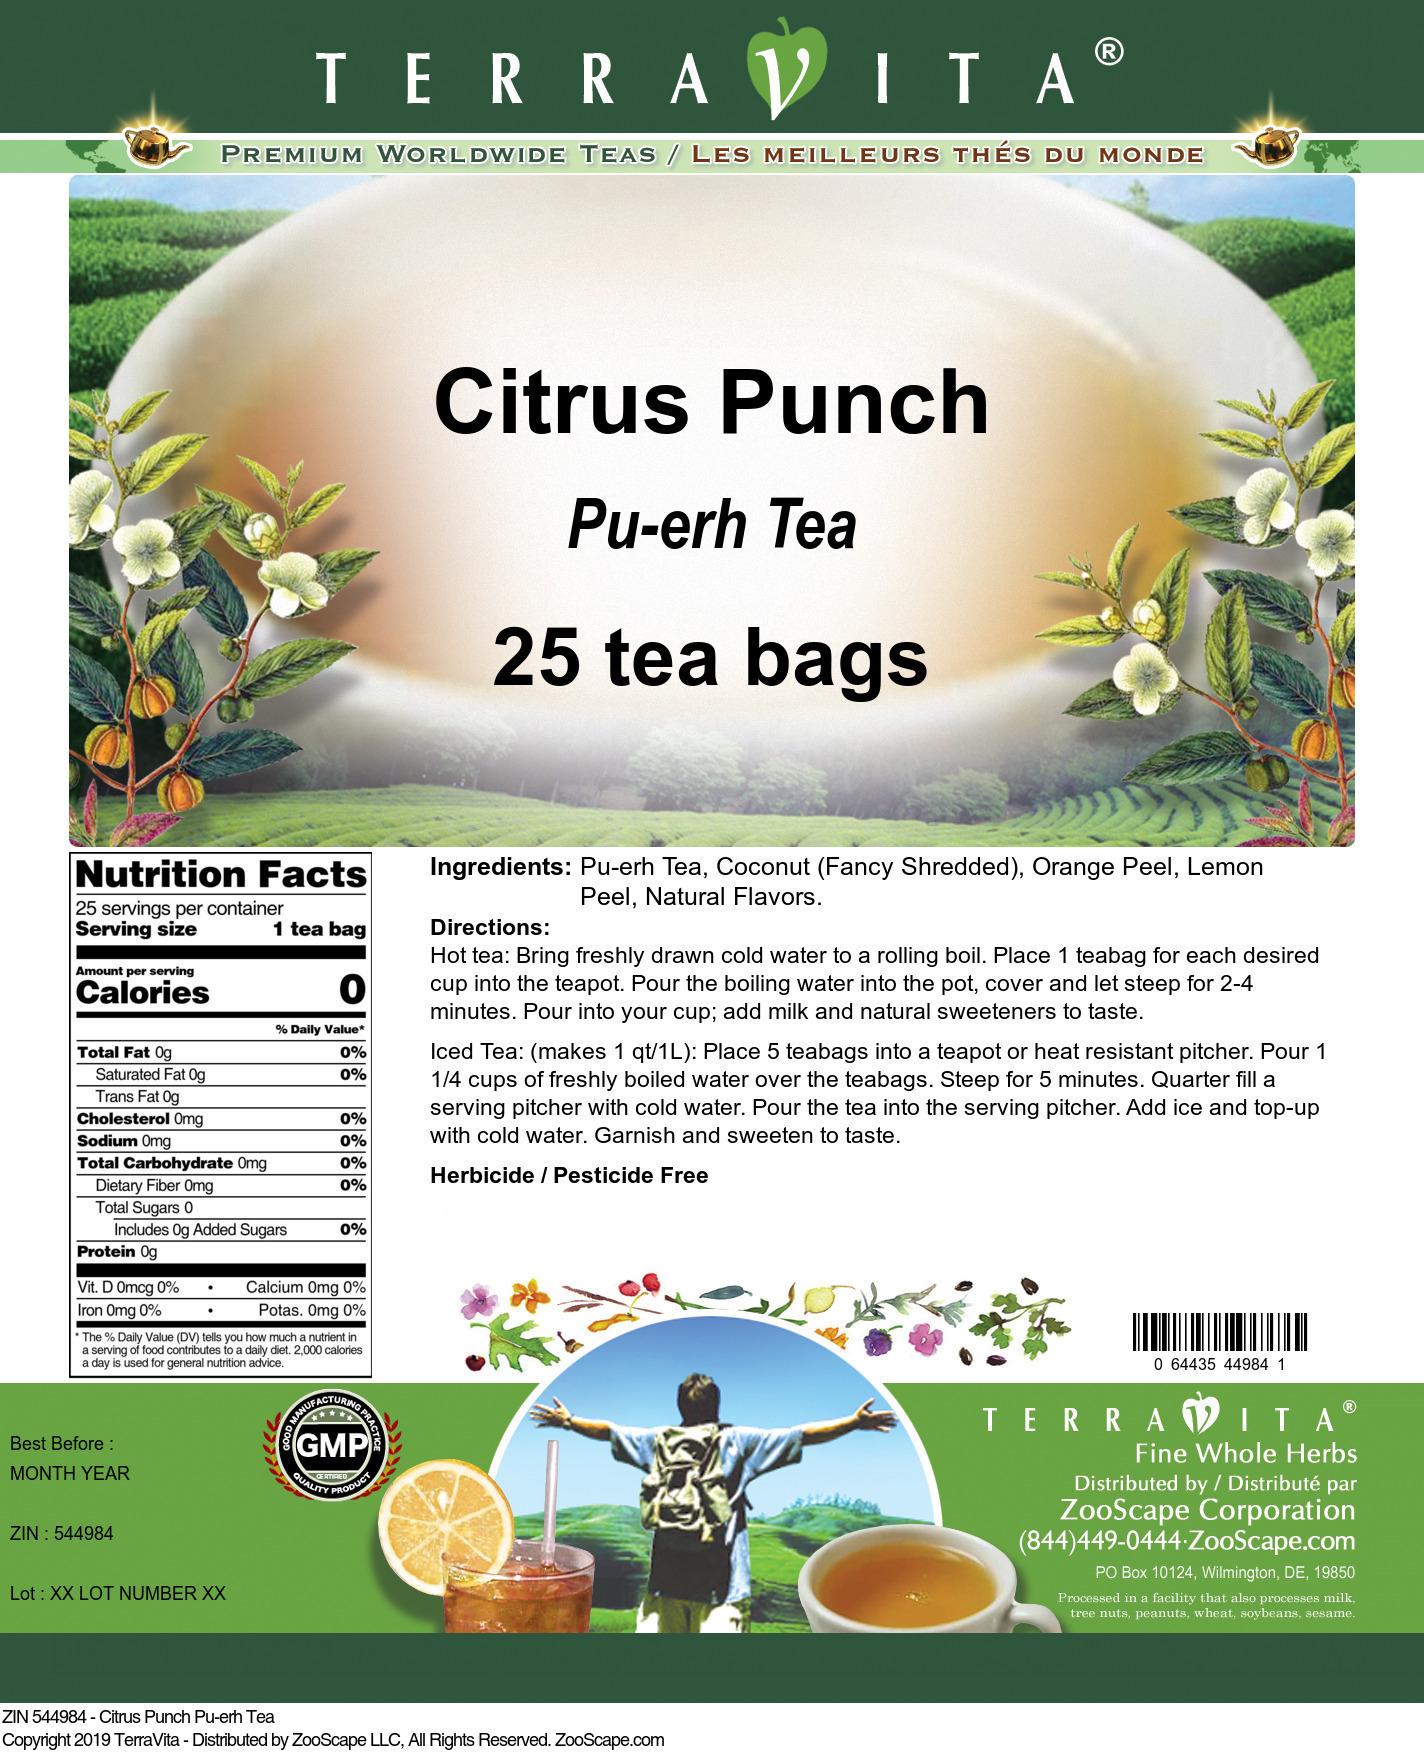 Citrus Punch Pu-erh Tea